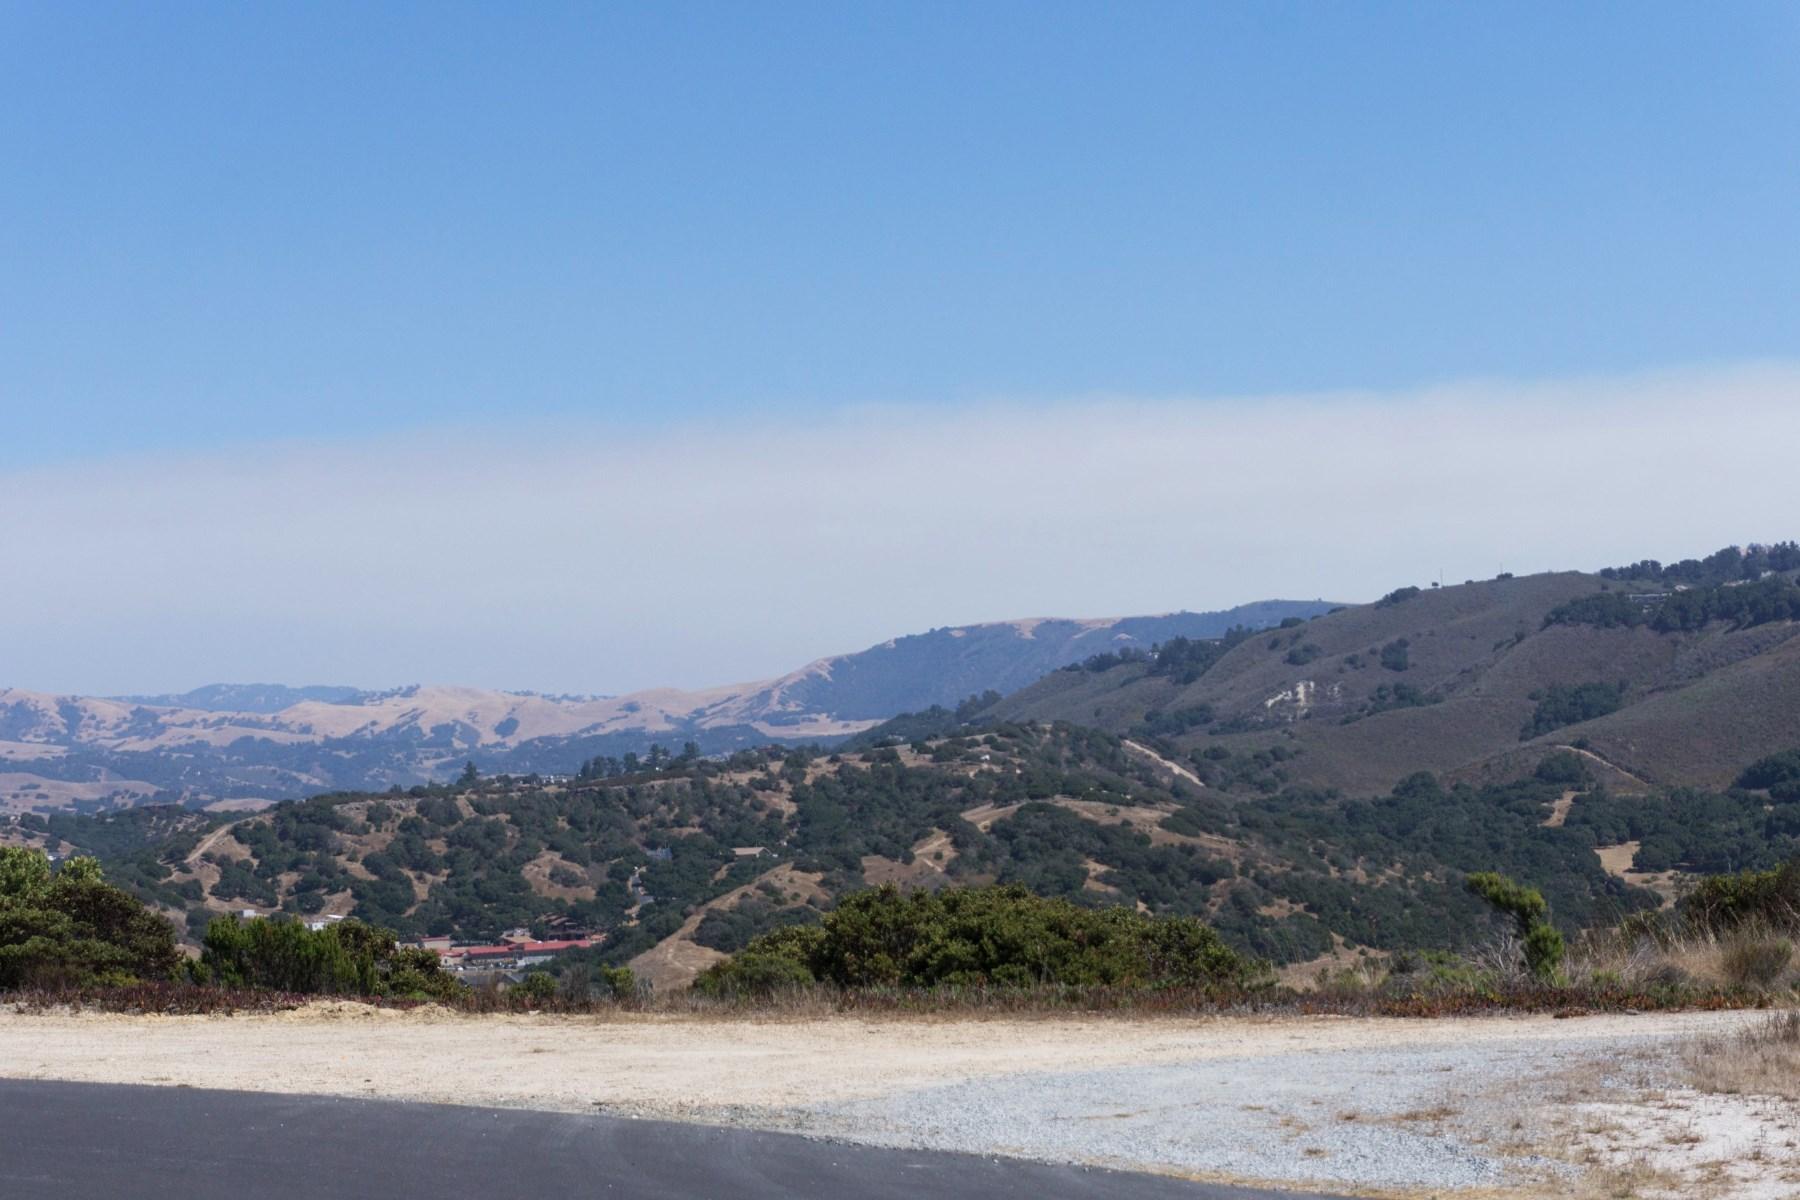 Đất đai vì Bán tại Fabulous View Lot 502 Estrella Doro Monterey, California, 93940 Hoa Kỳ